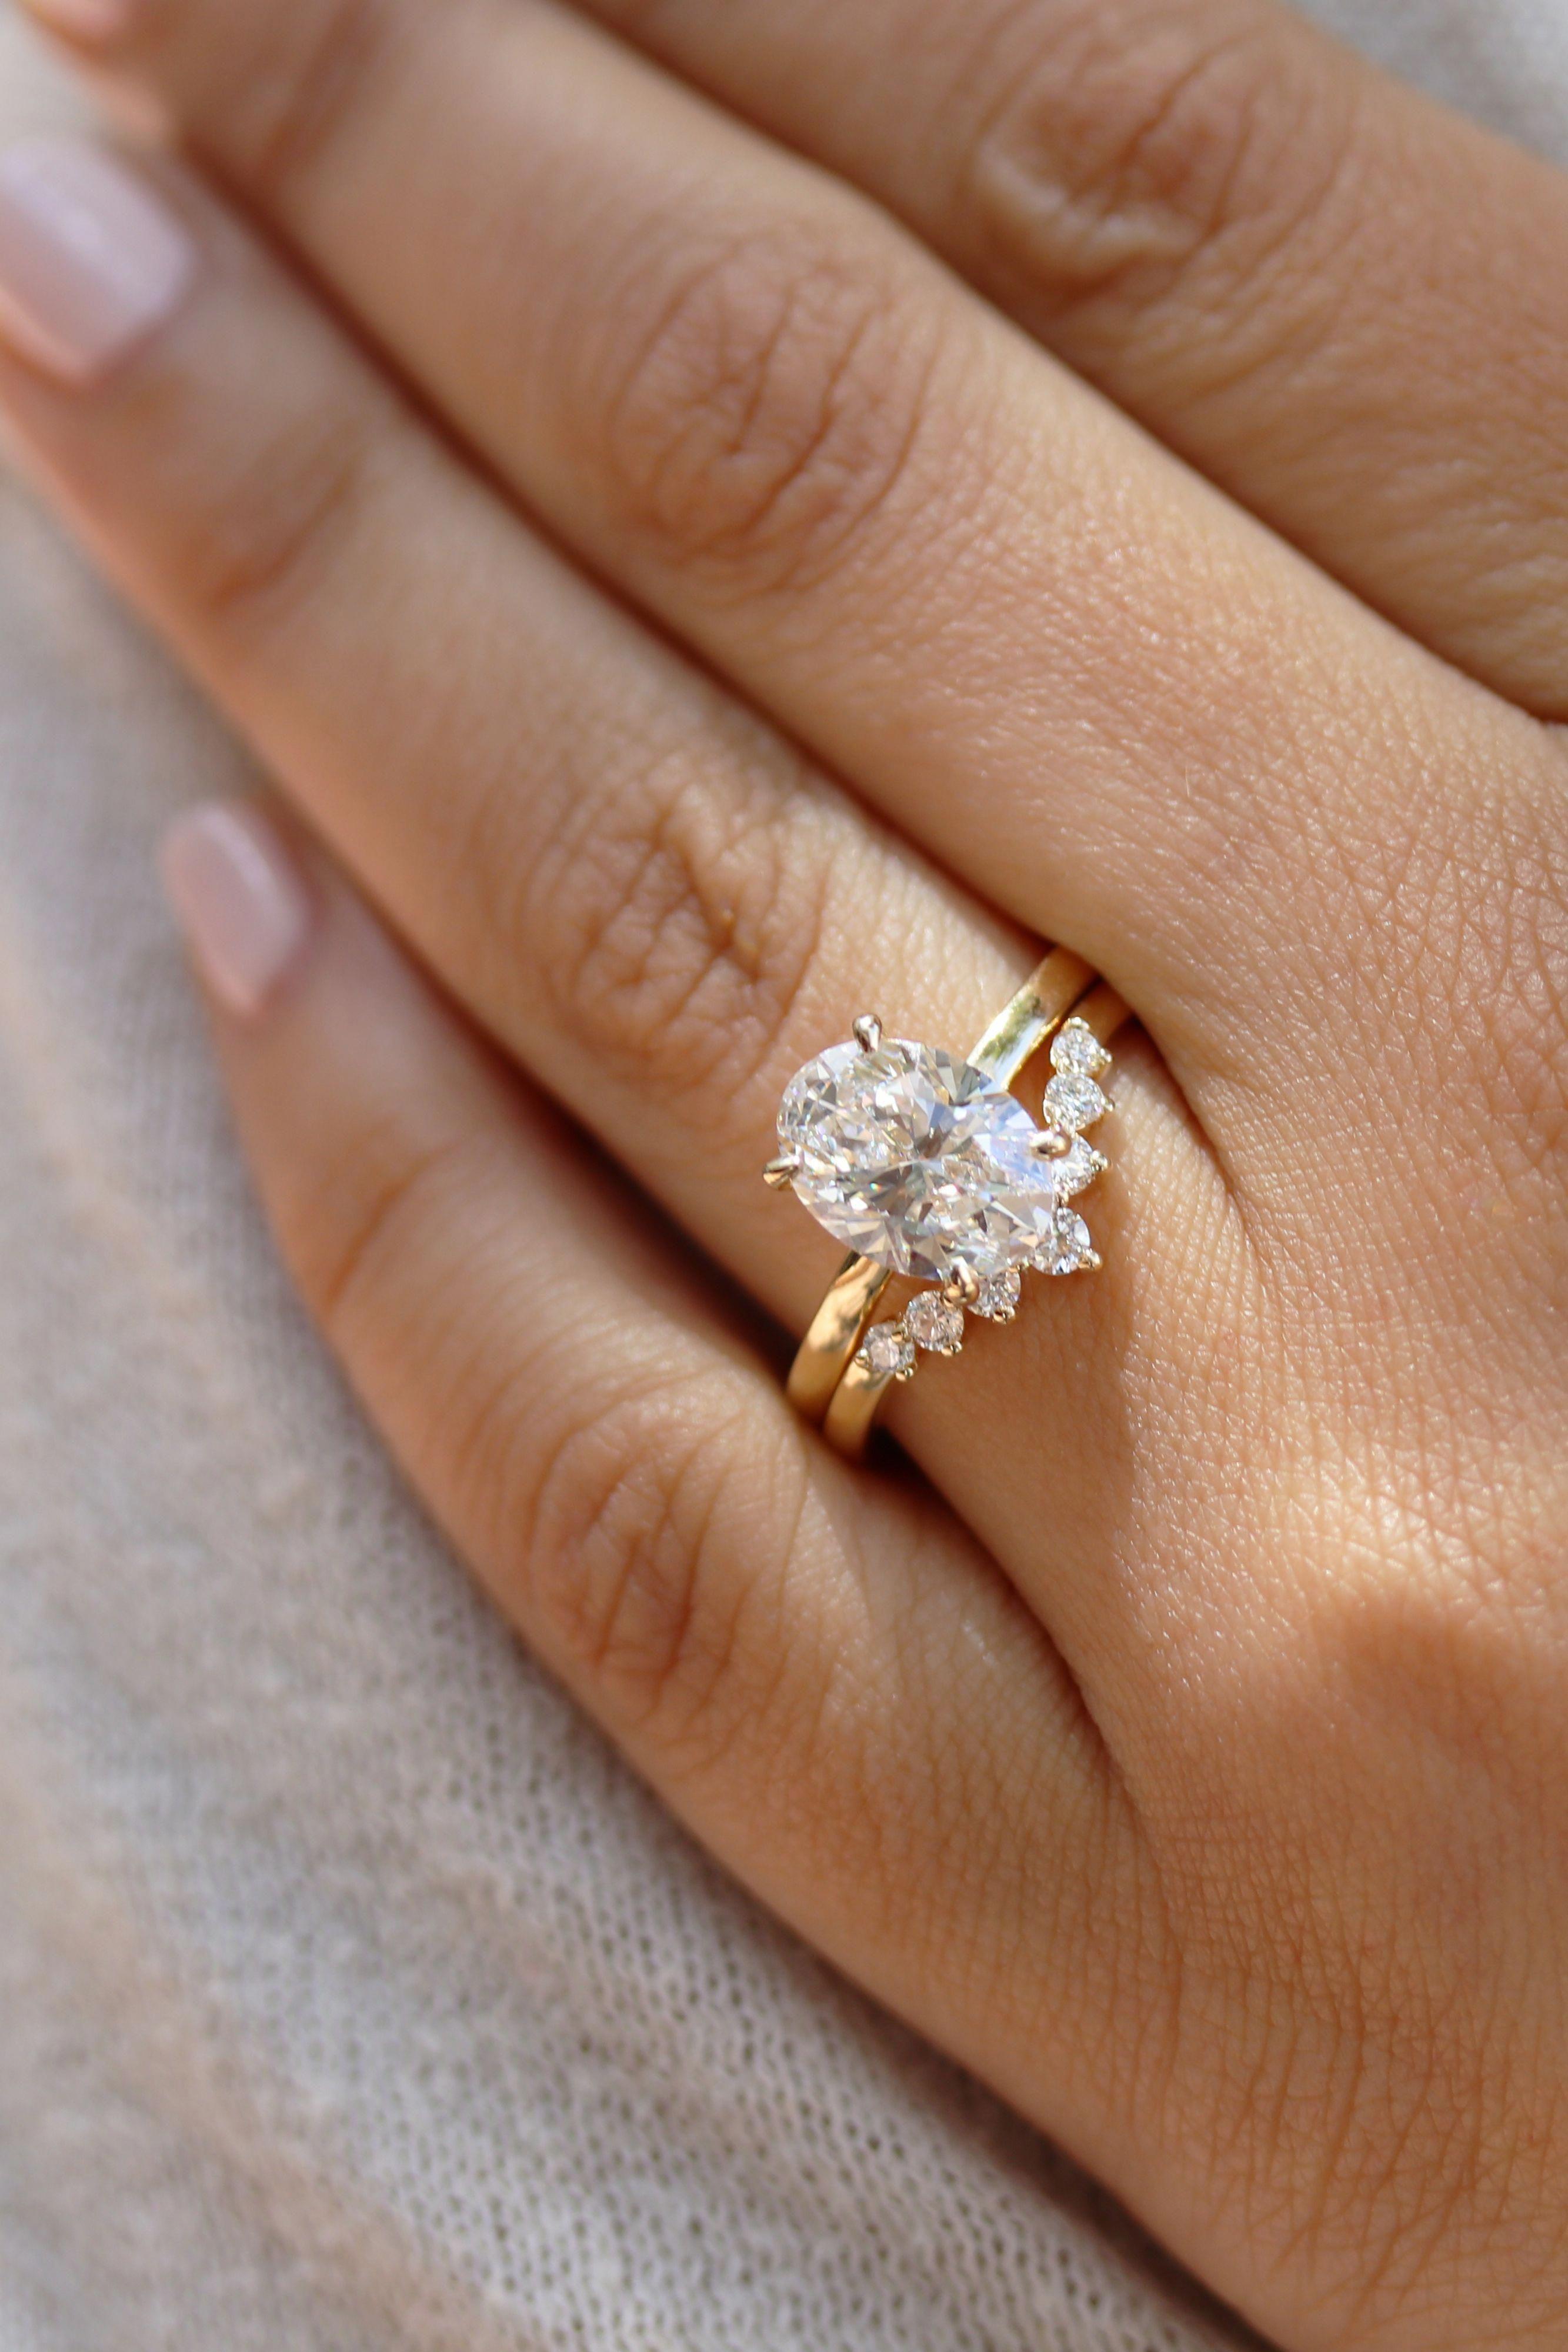 Omg I like these big wedding rings bigweddingrings